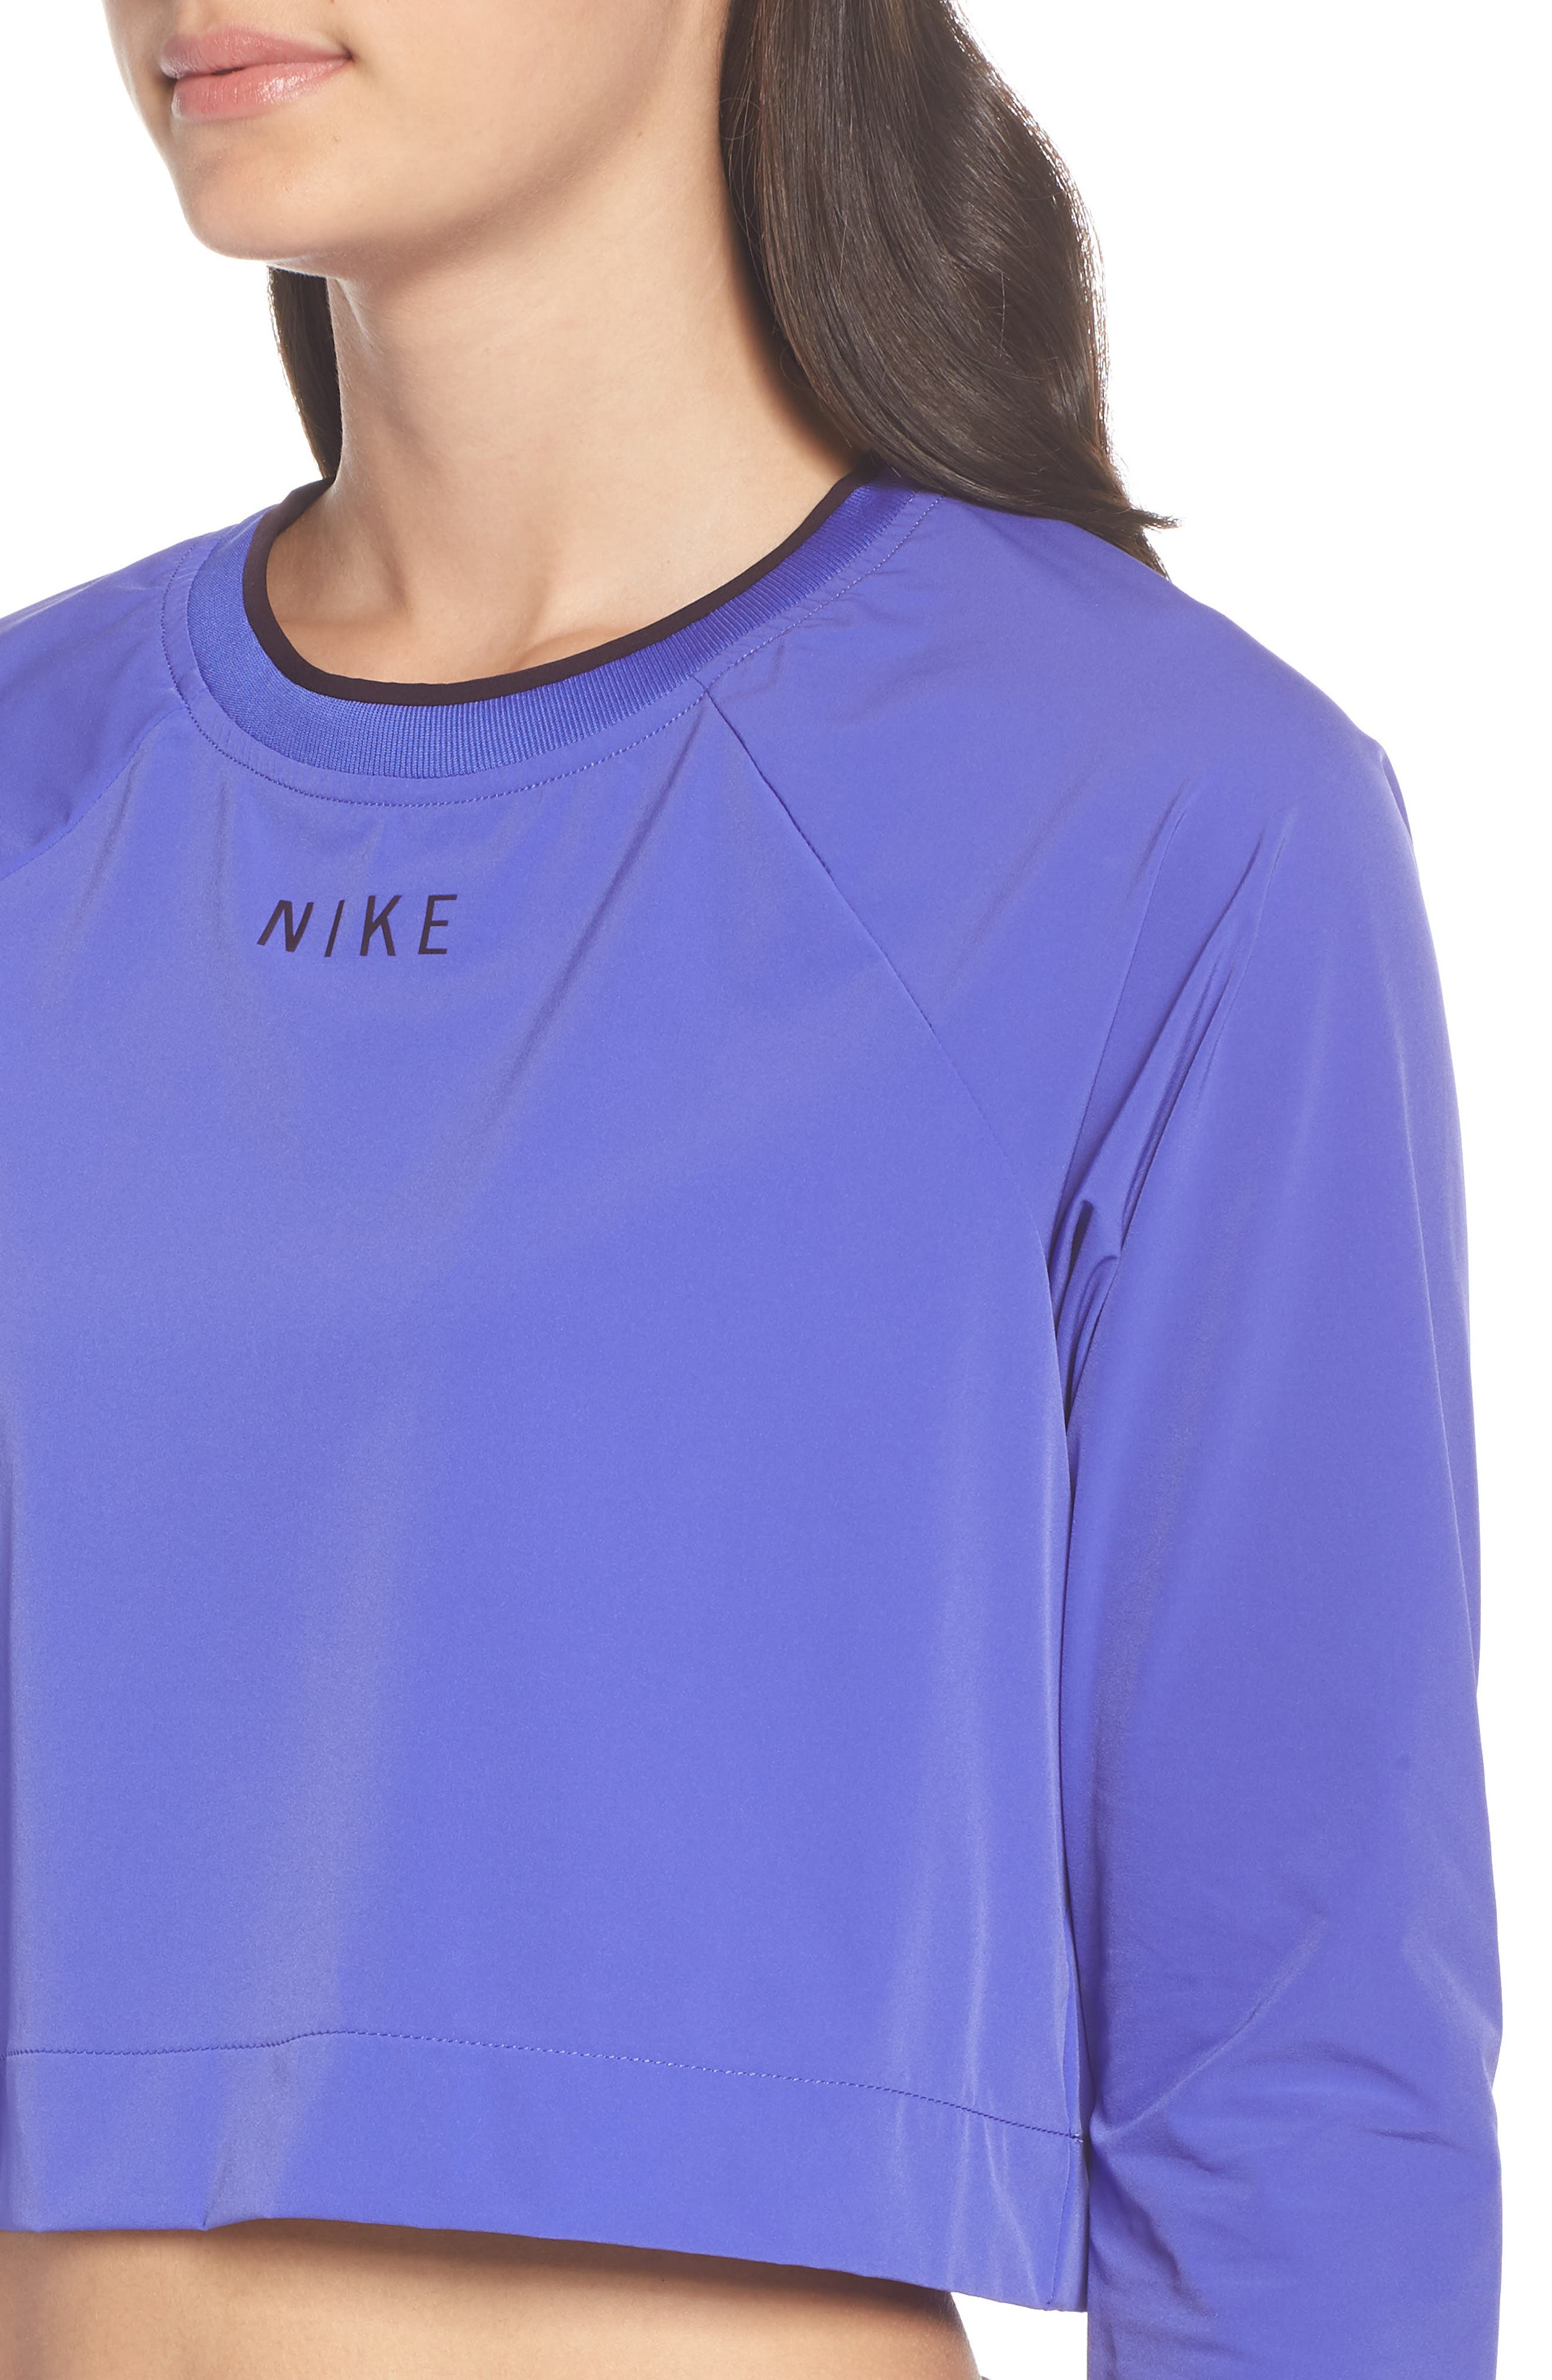 Sportswear Tech Pack Women's Long Sleeve Top,                             Alternate thumbnail 4, color,                             PERSIAN VIOLET/ BURGUNDY ASH